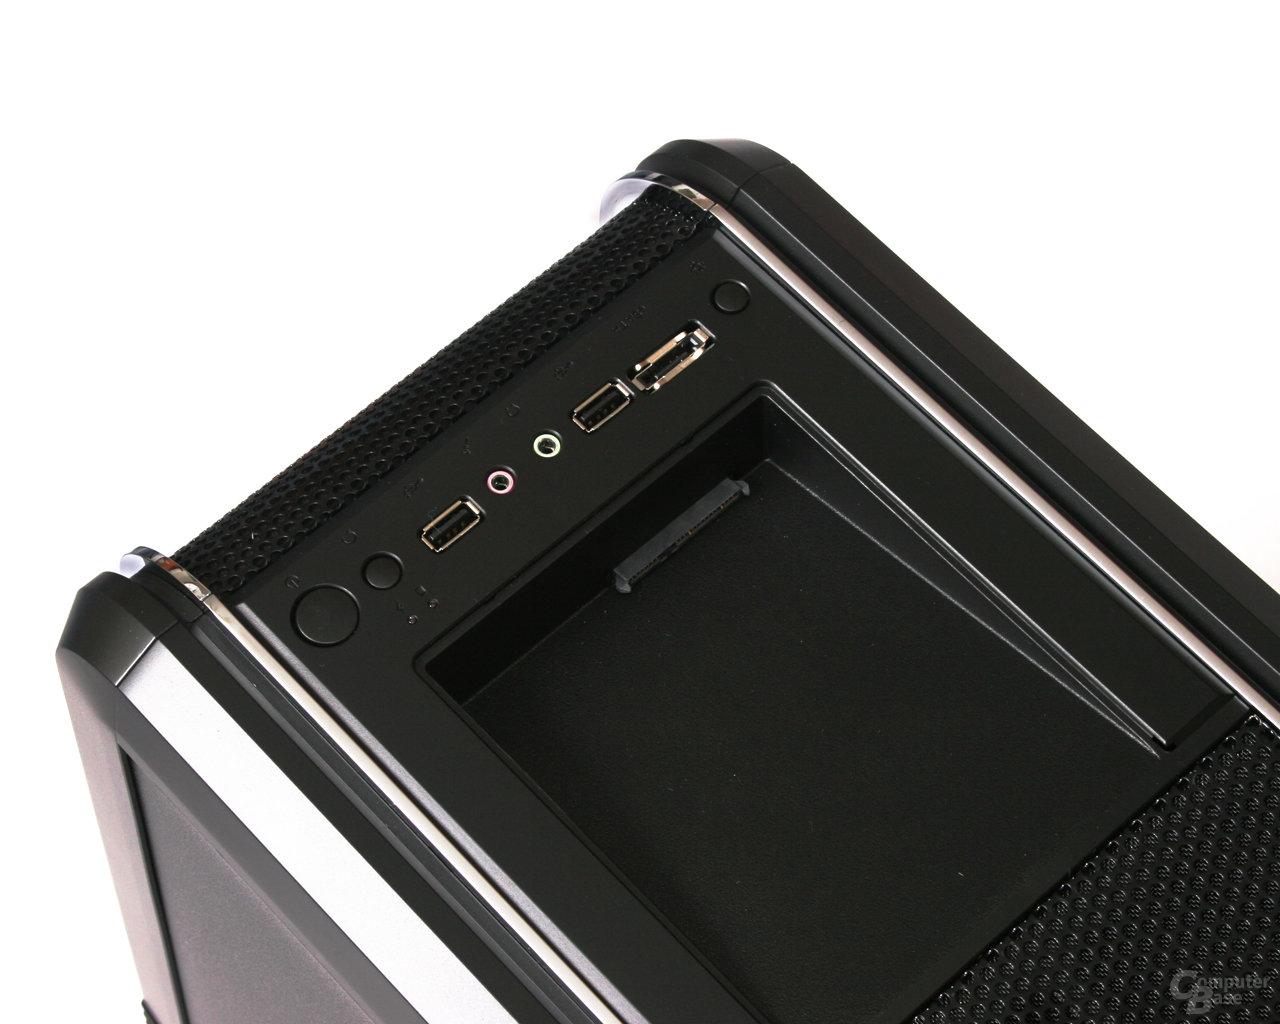 Festplatten-Adapter